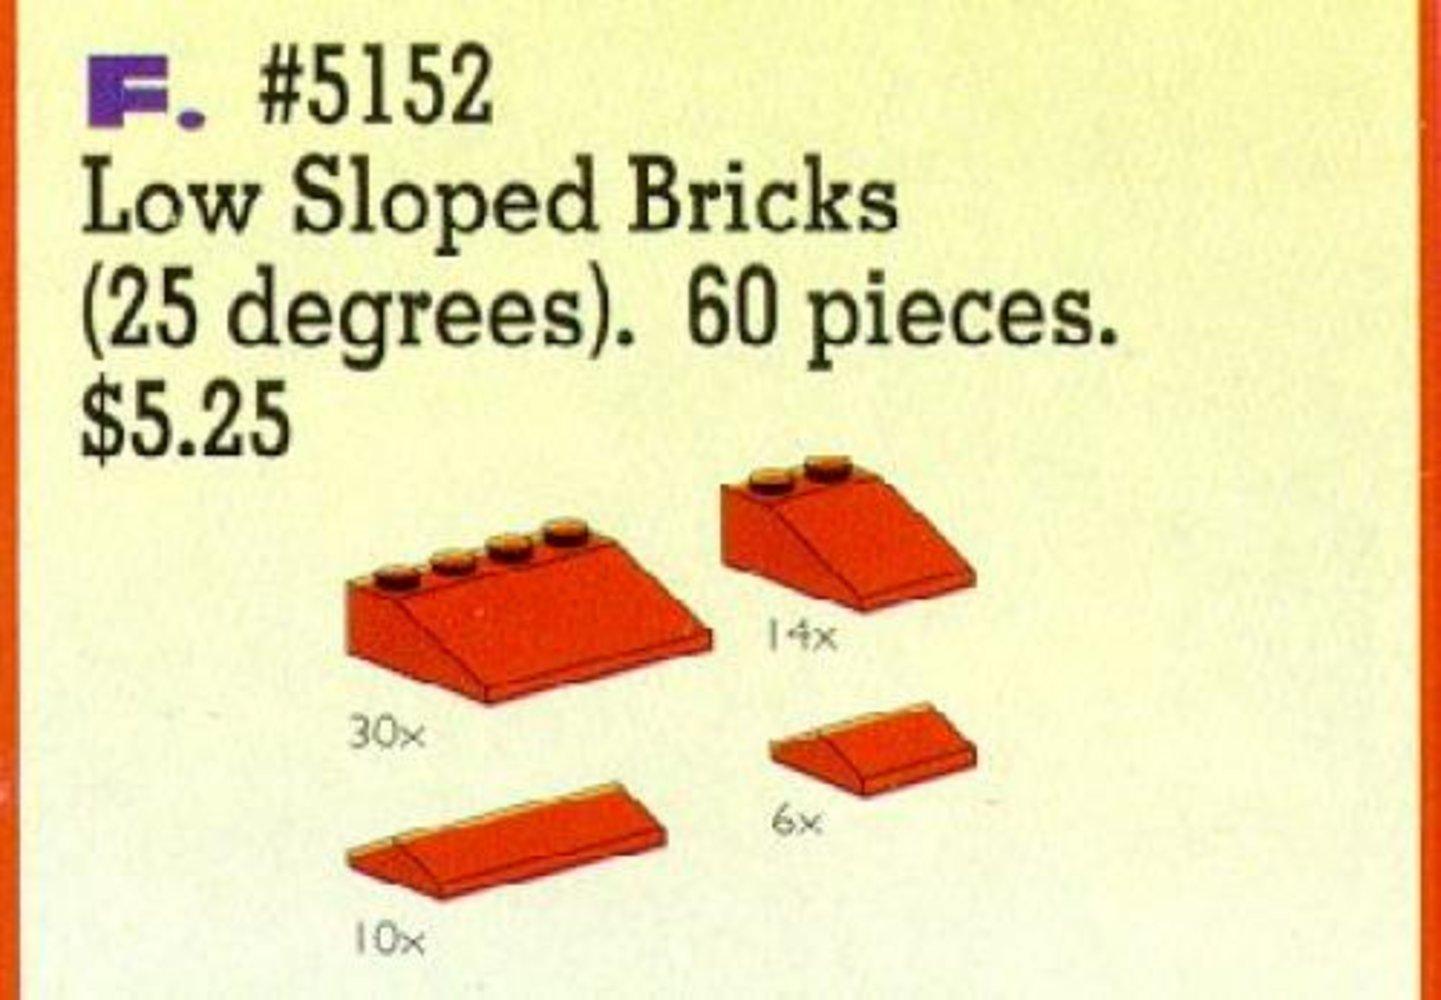 Roof Bricks, Red, 25 Degrees